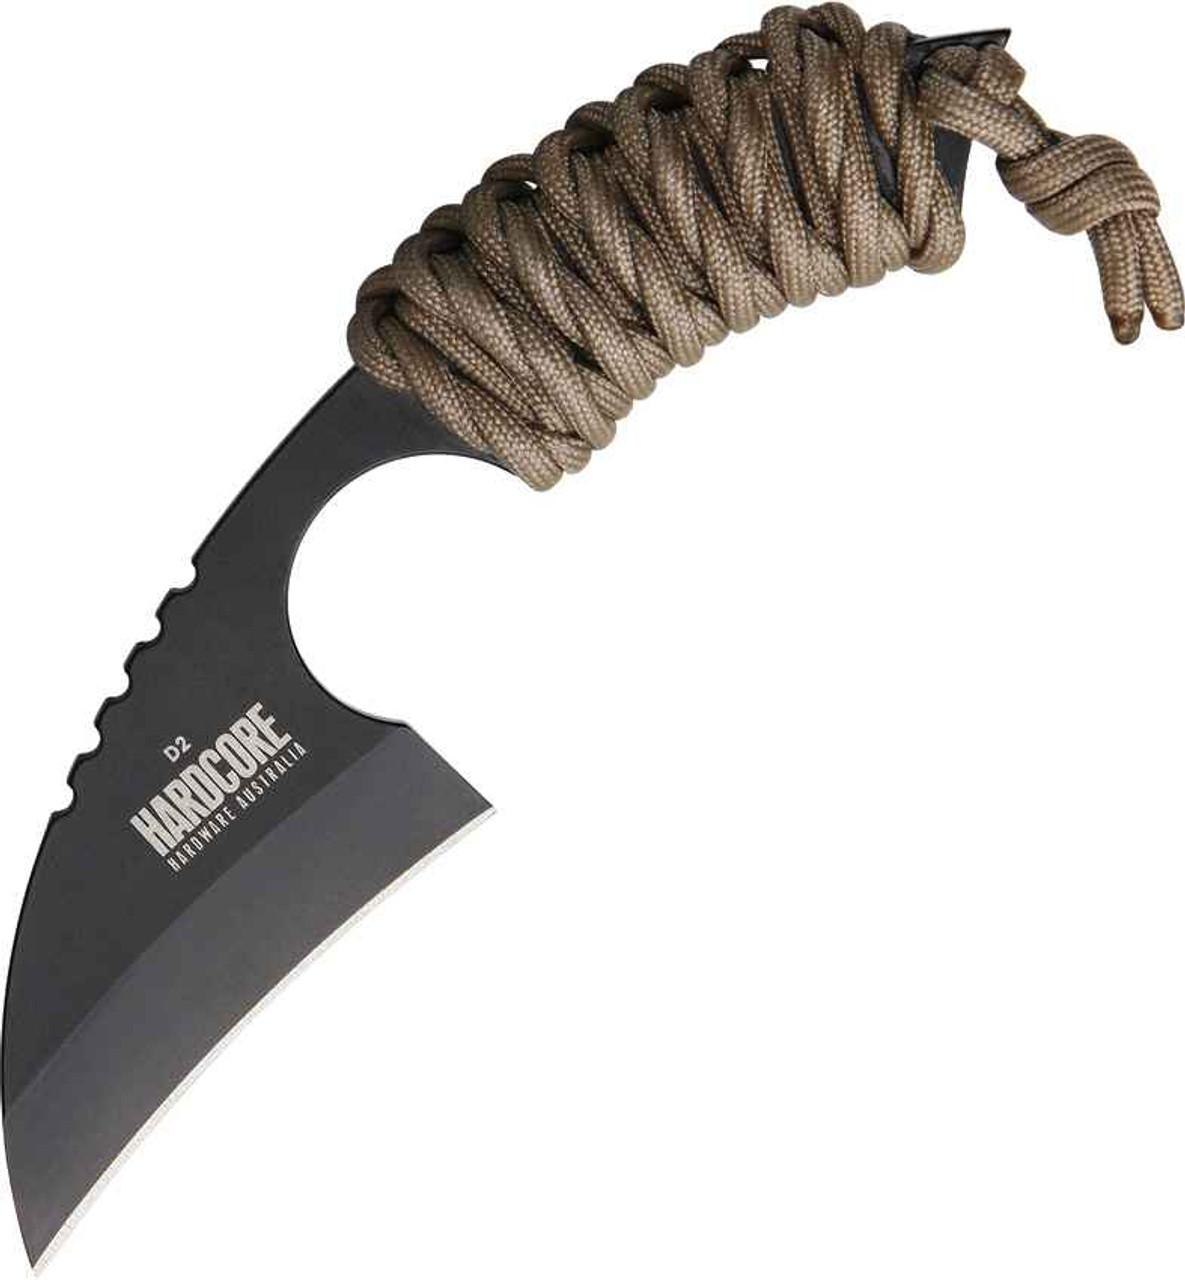 Hardcore Hardware Australia Little Field Knife, D2 Steel, Coyote Brown Para-cord Handle